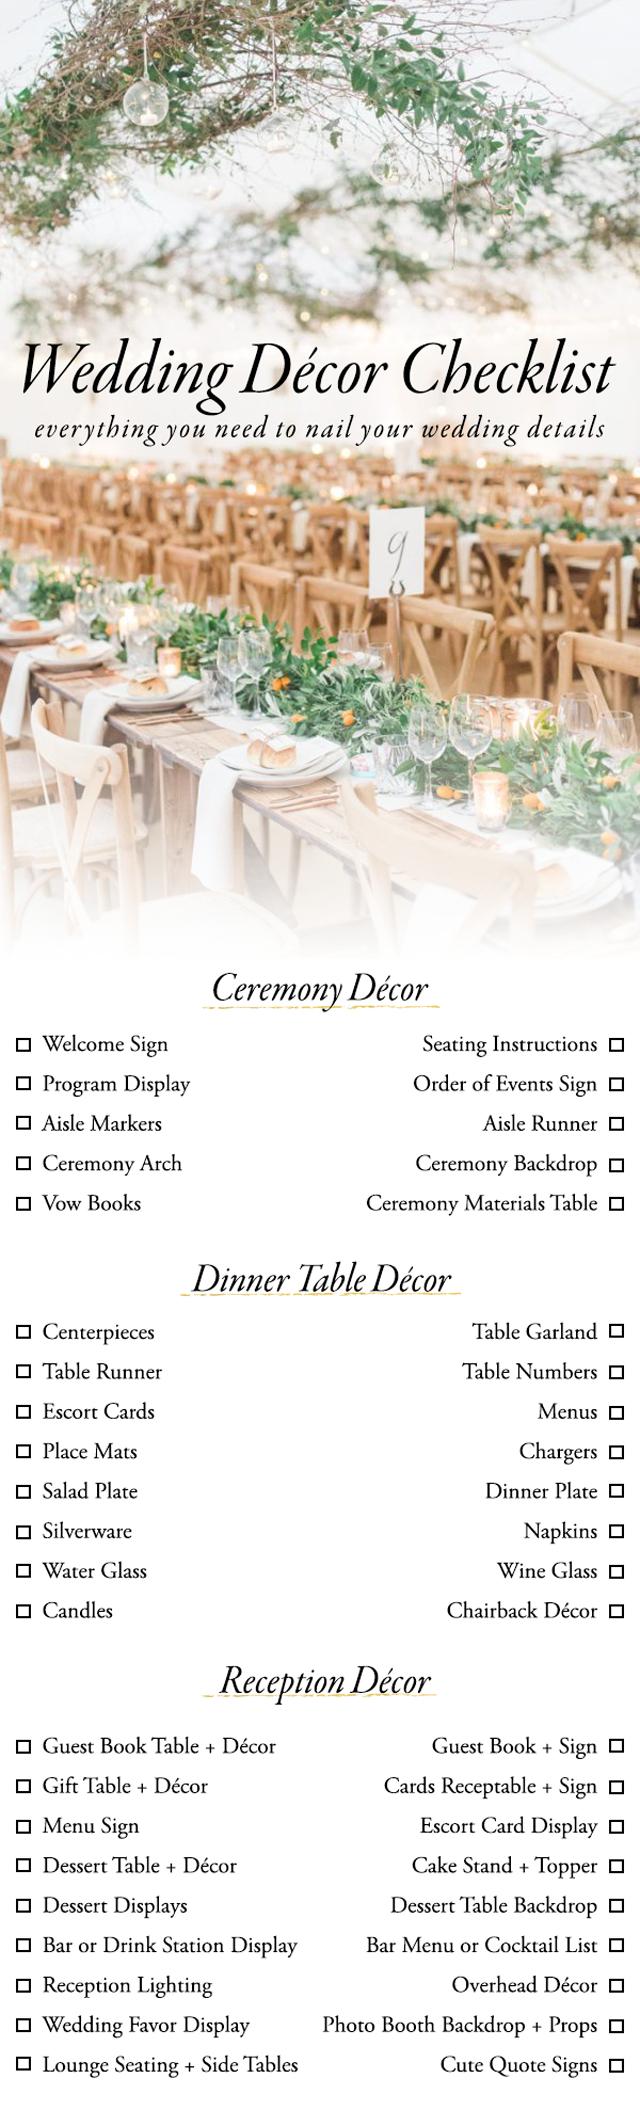 10 Printable Wedding Checklists For The Organized Bride – Sheknows - Free Printable Wedding Decorations